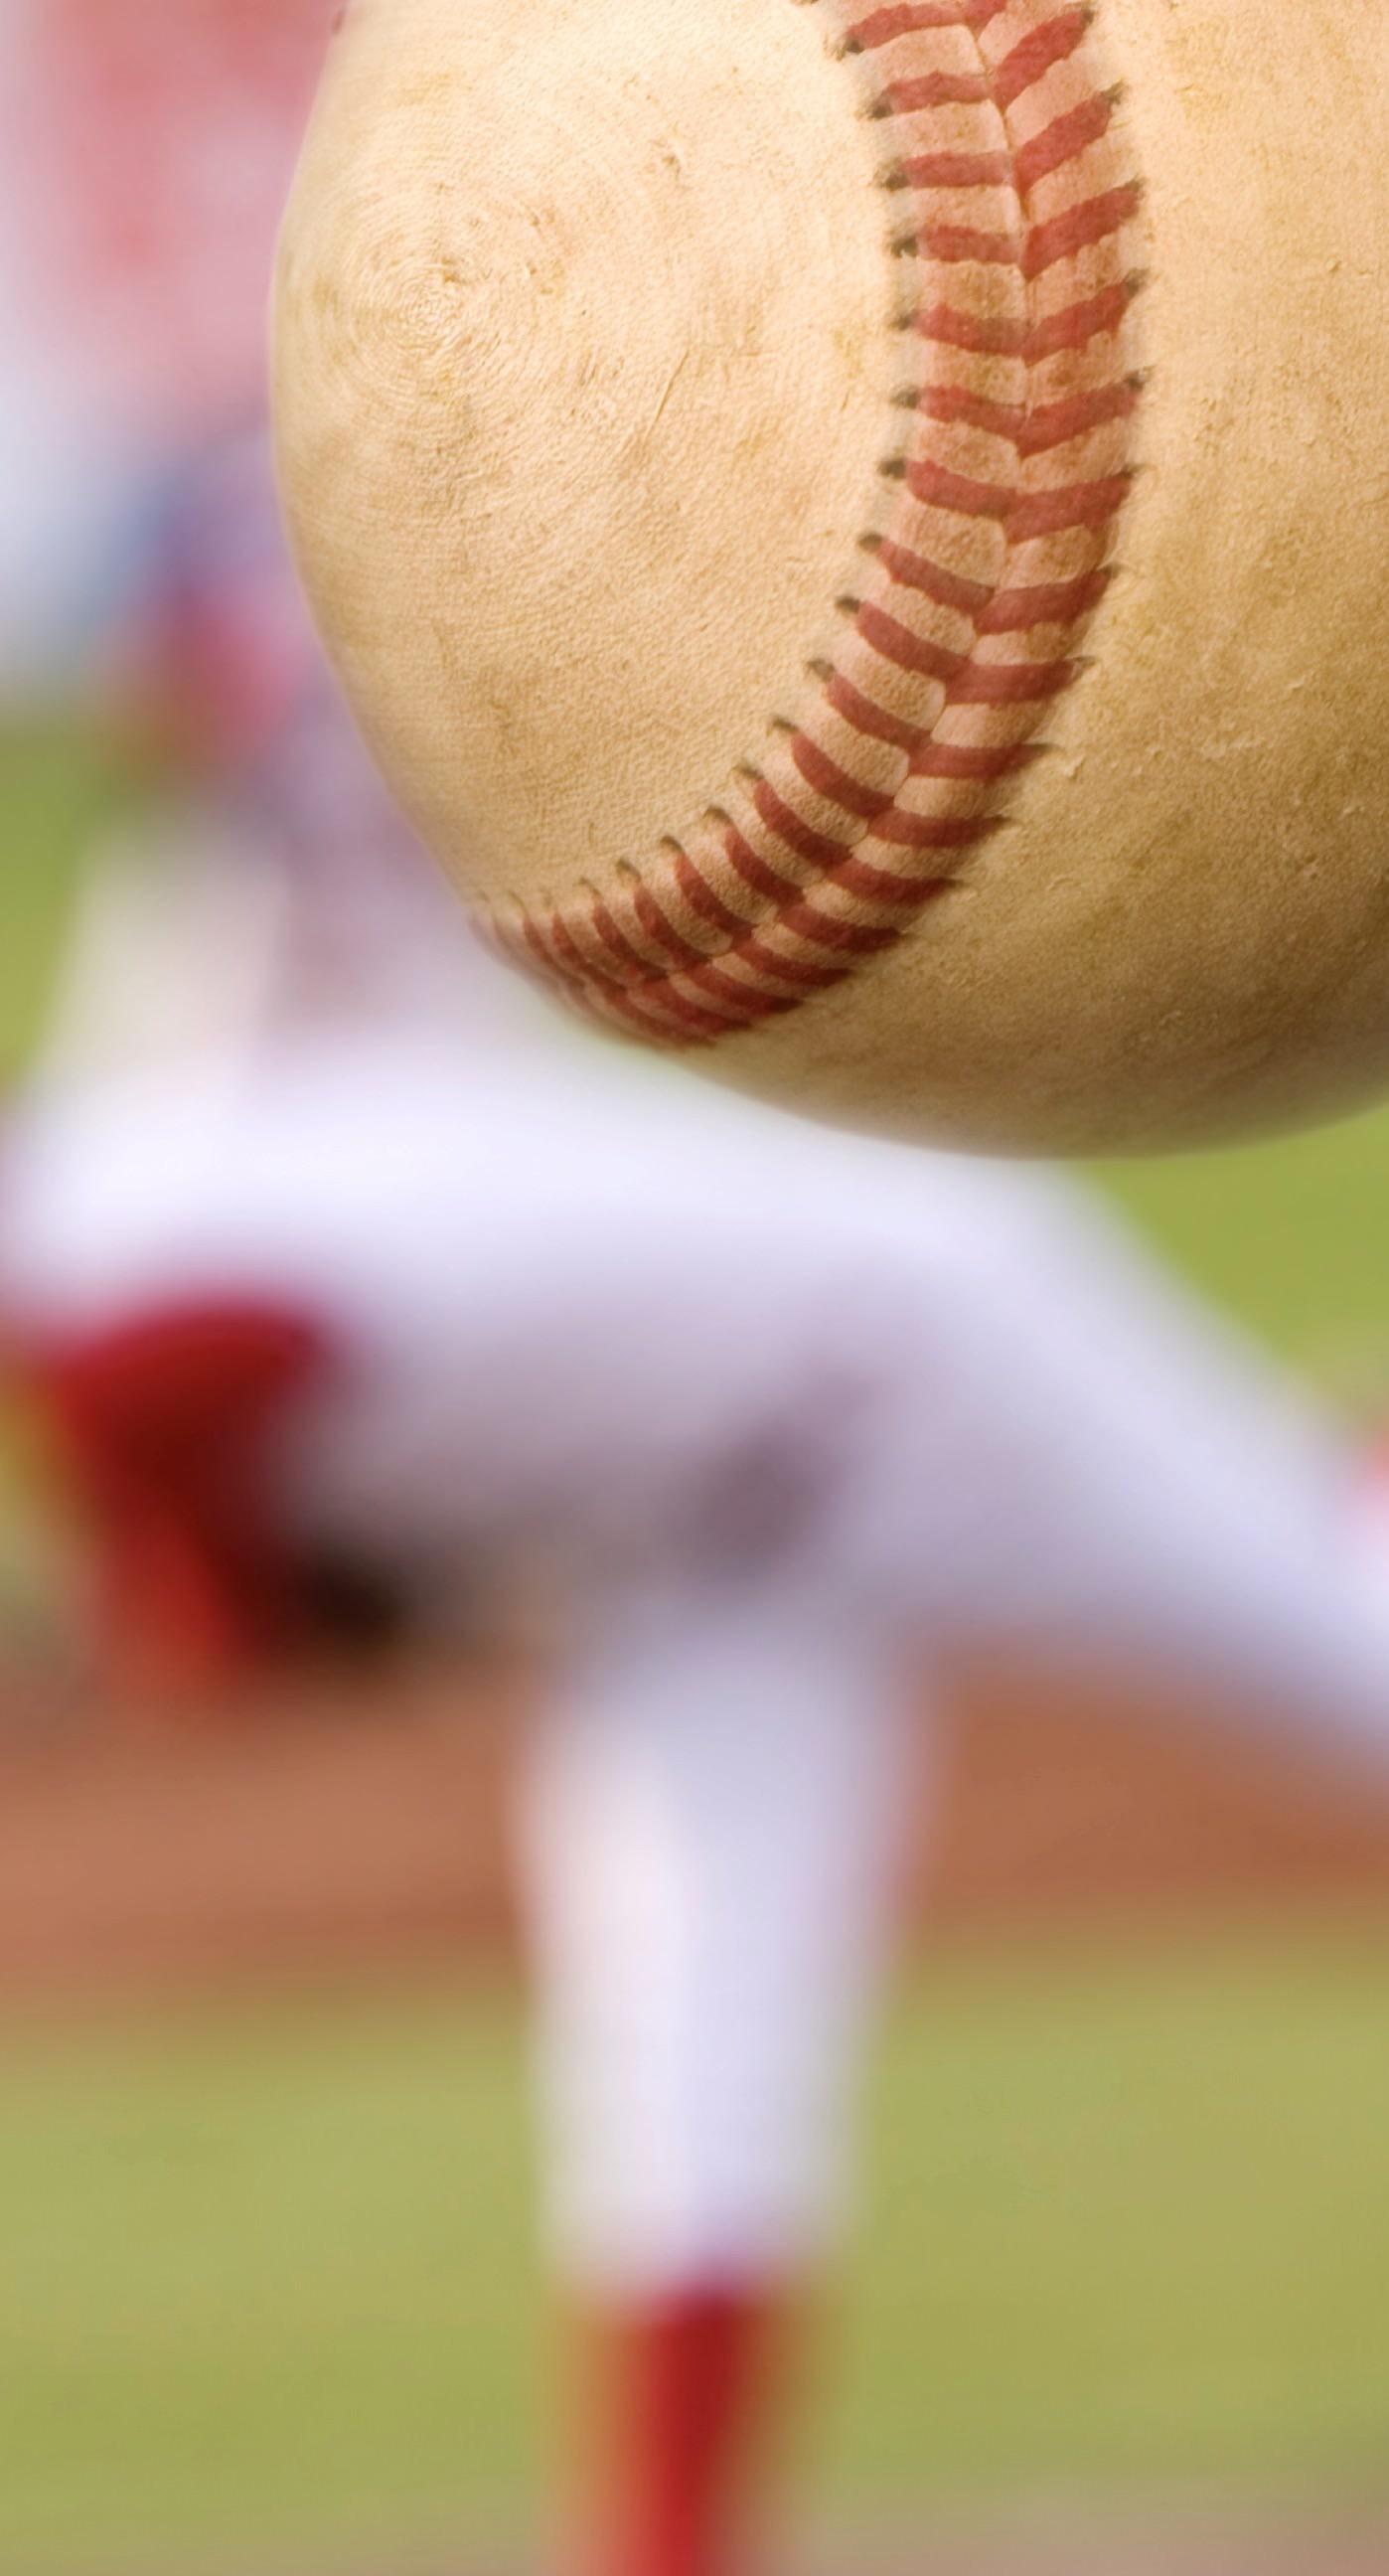 Texas Rangers Wallpaper For Iphone 6 Baseball Phone Wallpaper 67 Images